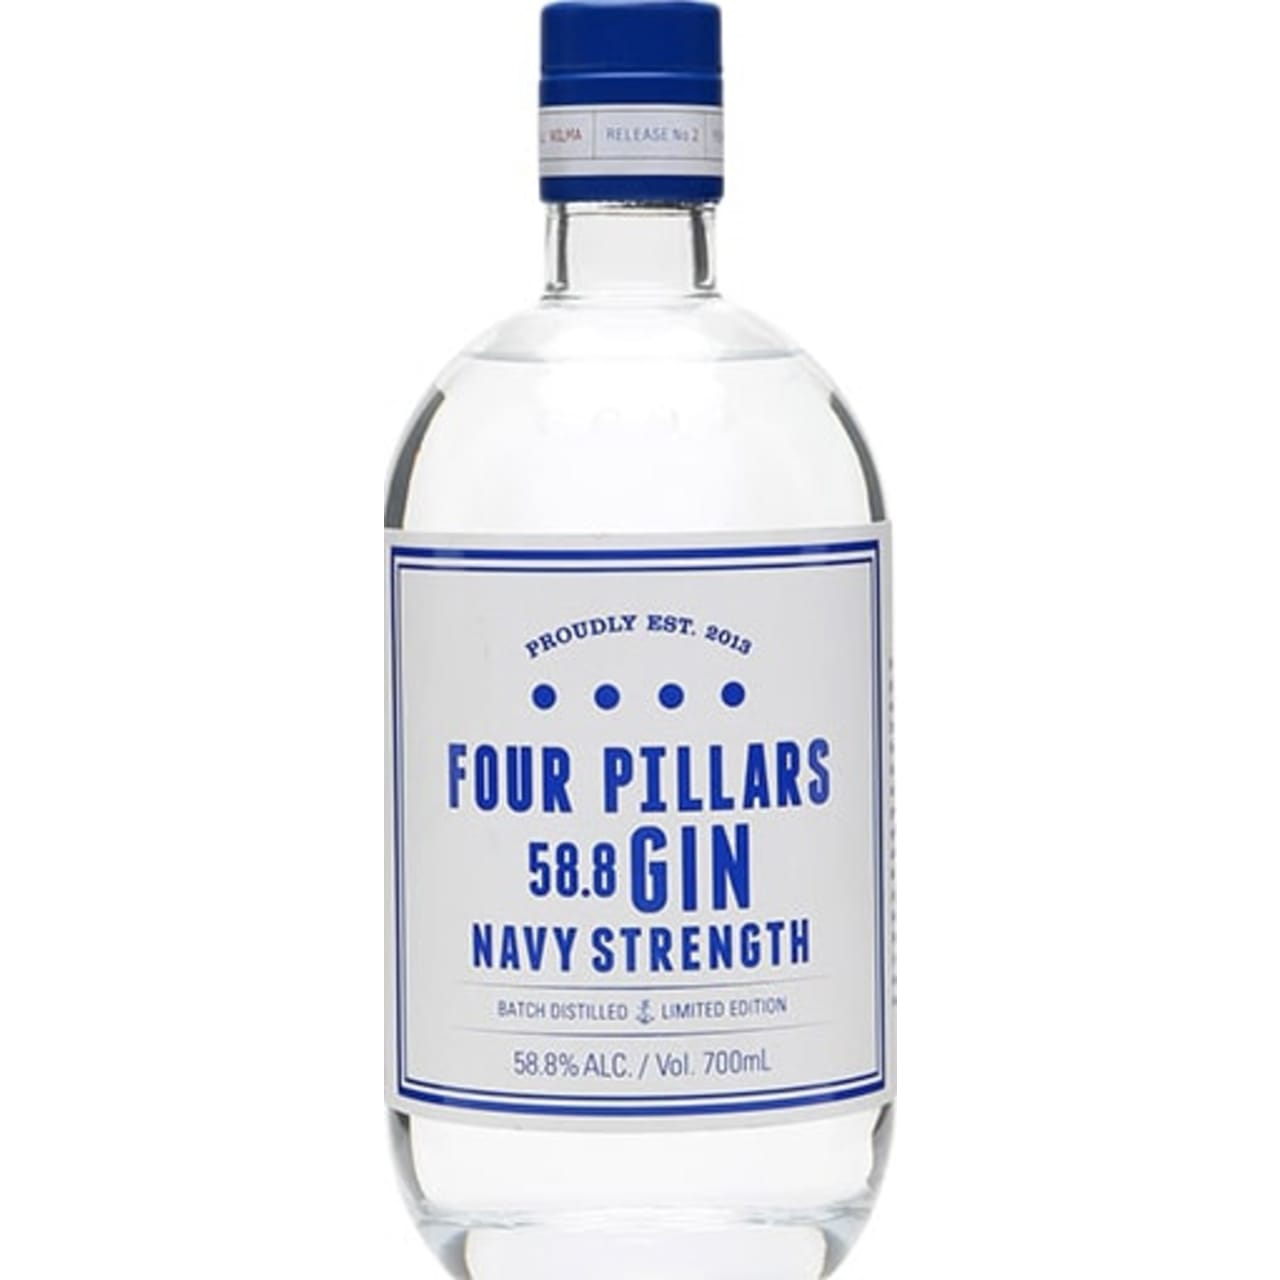 Product Image - Four Pillars Navy Strength Gin